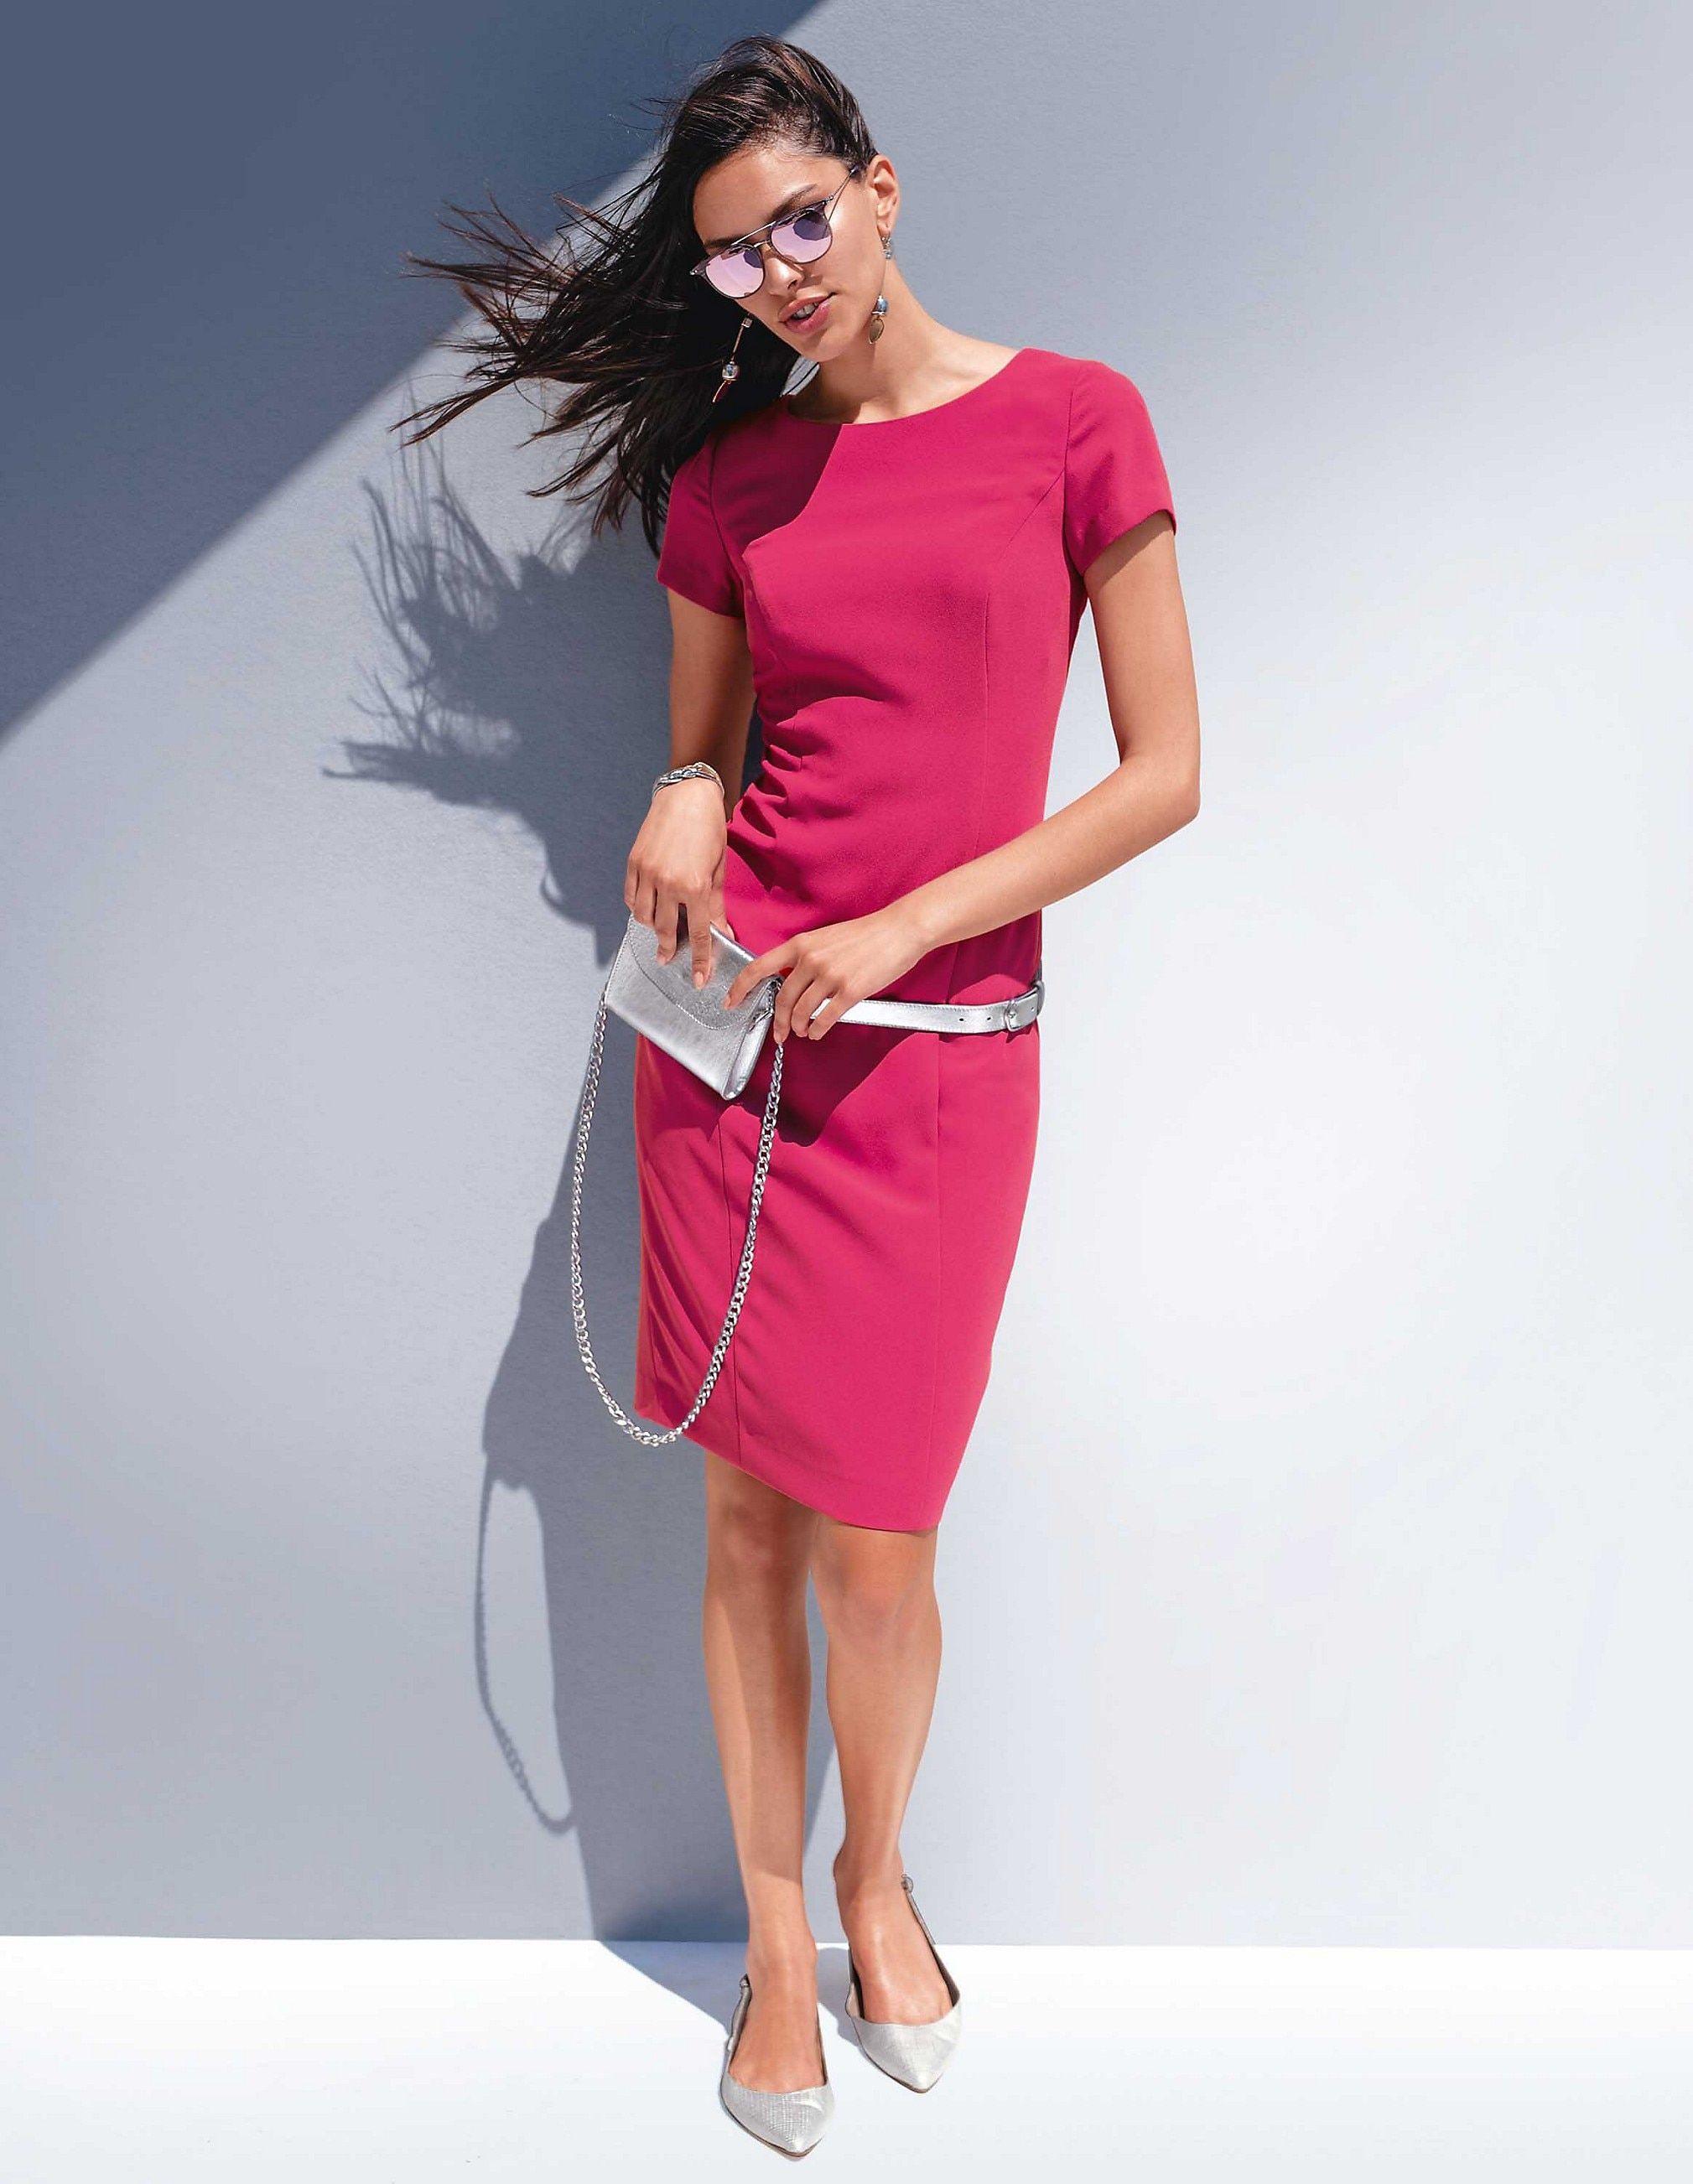 d7138386379ba Etuikleid mit Halbarm, erdbeerpink, pink | MADELEINE Mode Etuikleid mit  Halbarm, erdbeerpink,